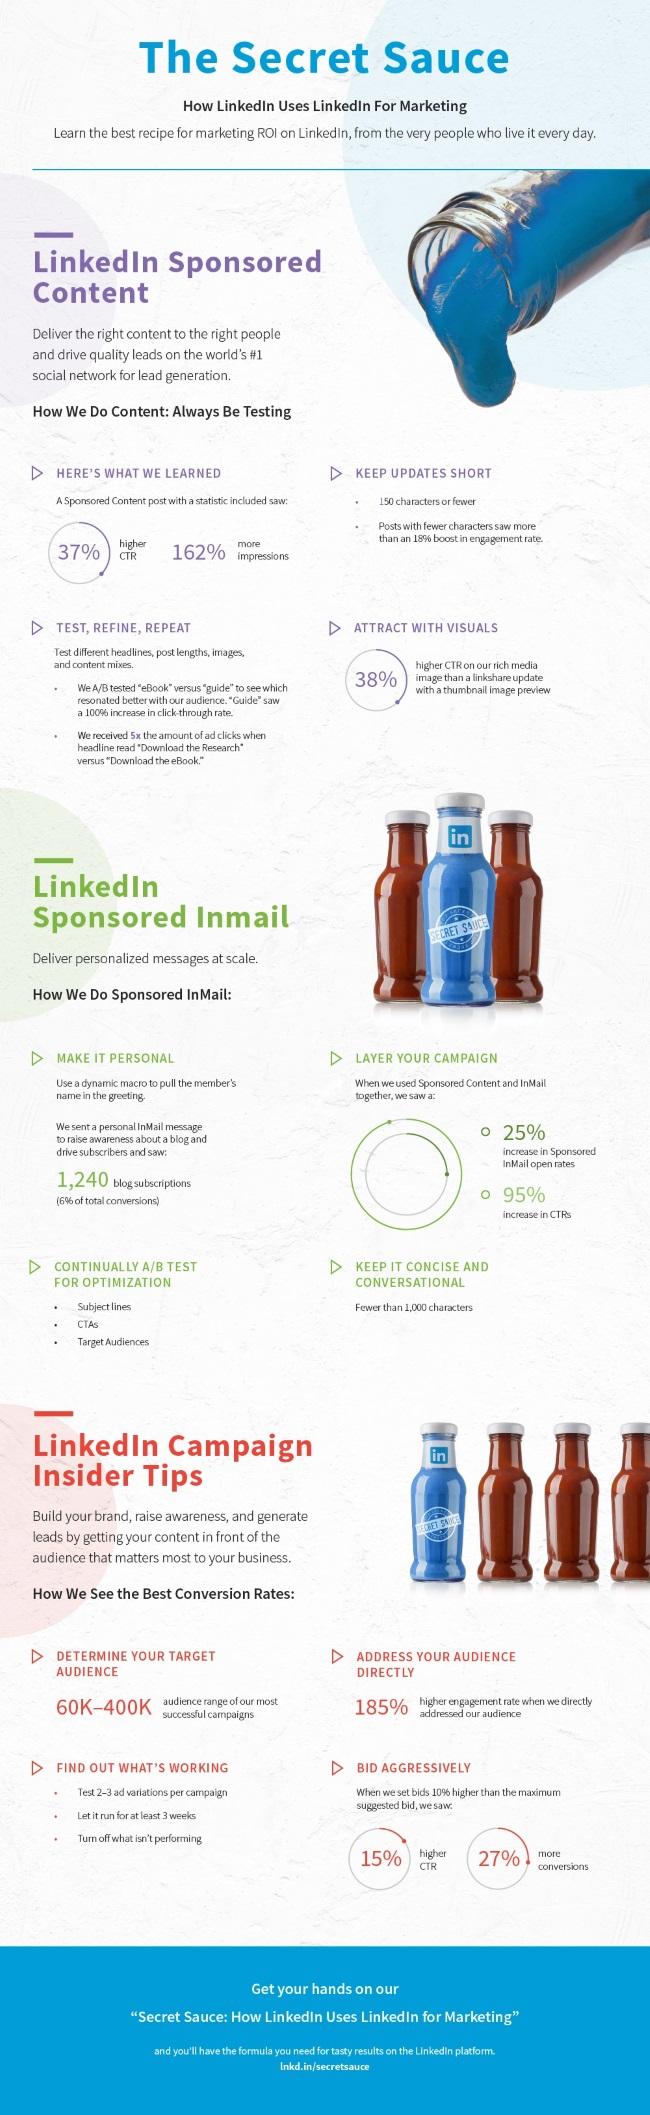 linkedinmarketinginfographic